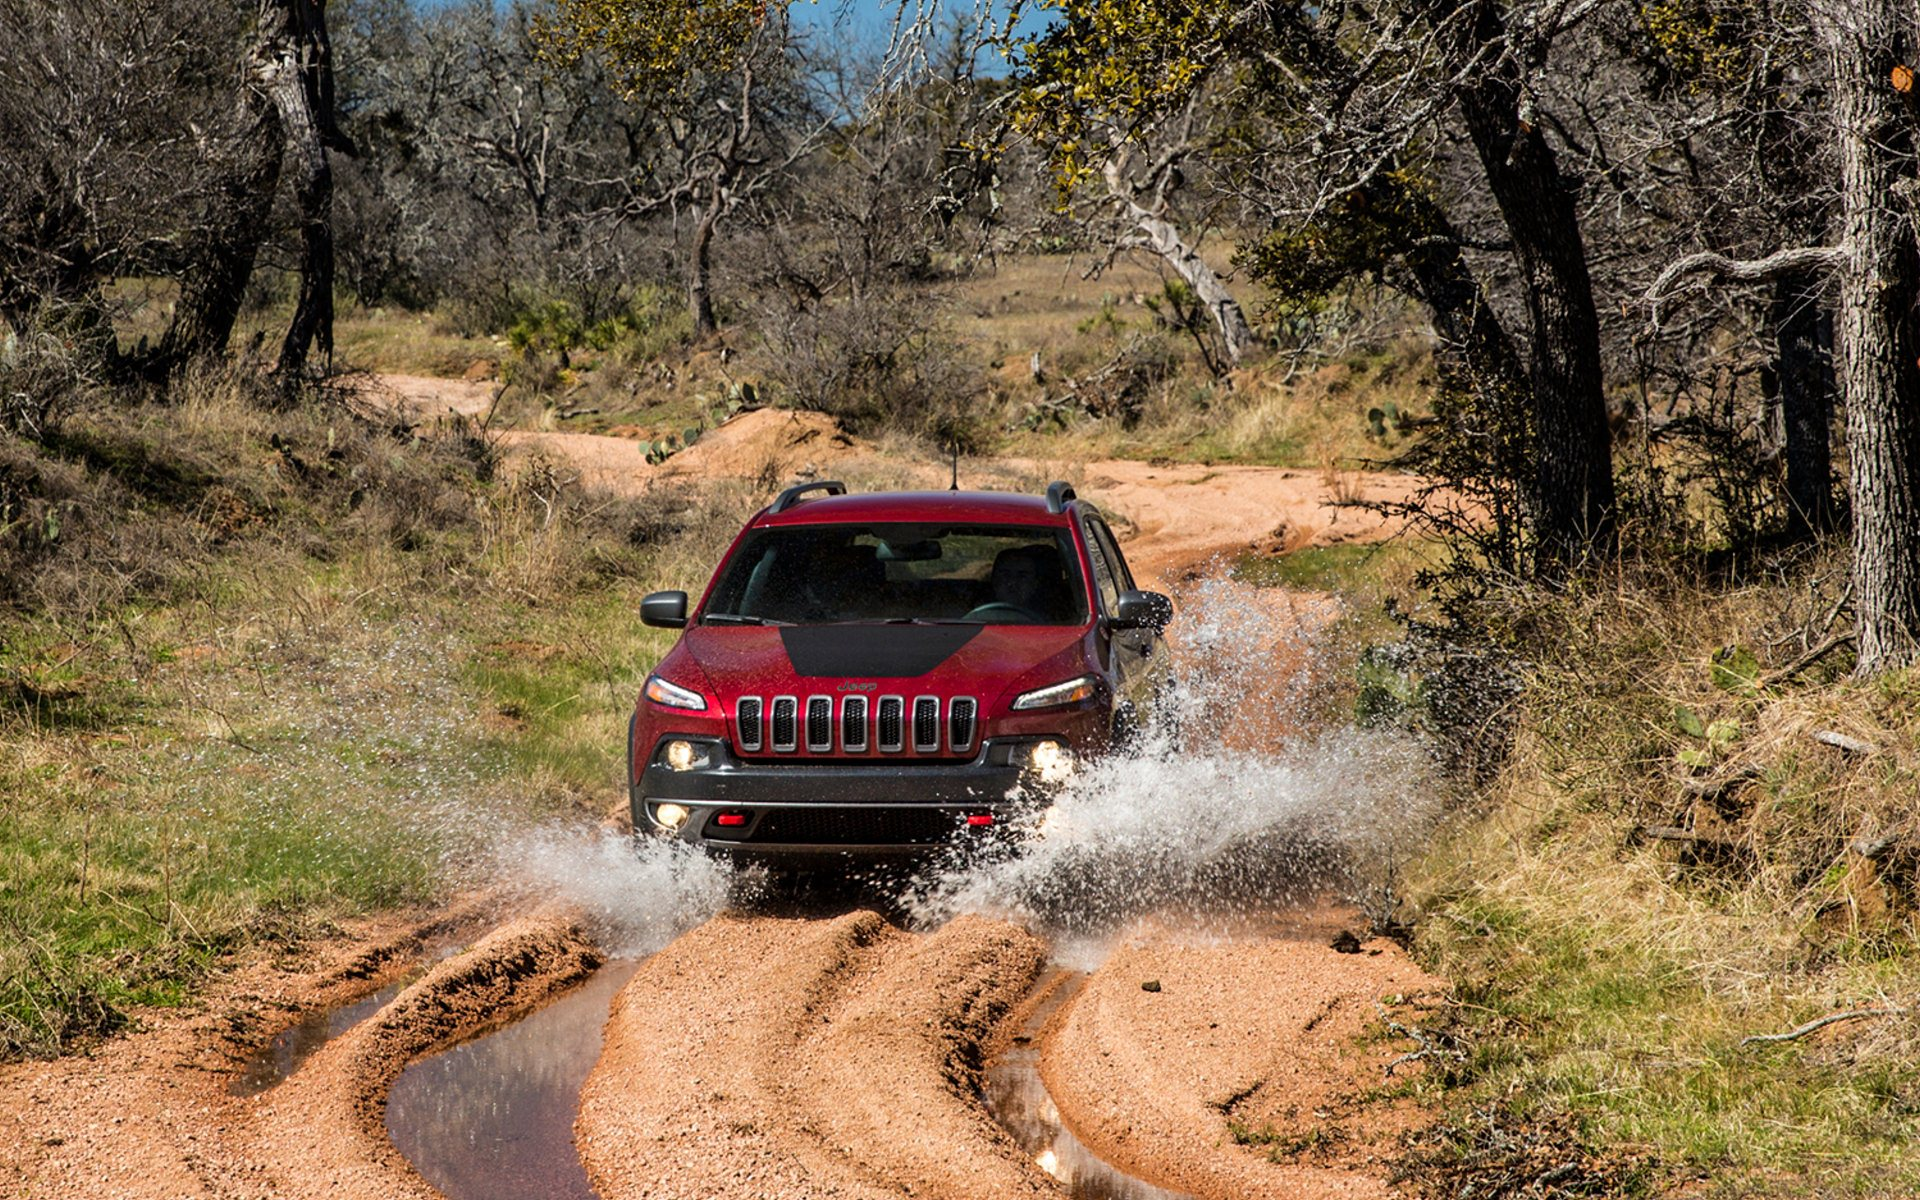 2014 Jeep Cherokee Off Road Widescreen HD Wallpaper 1920x1200